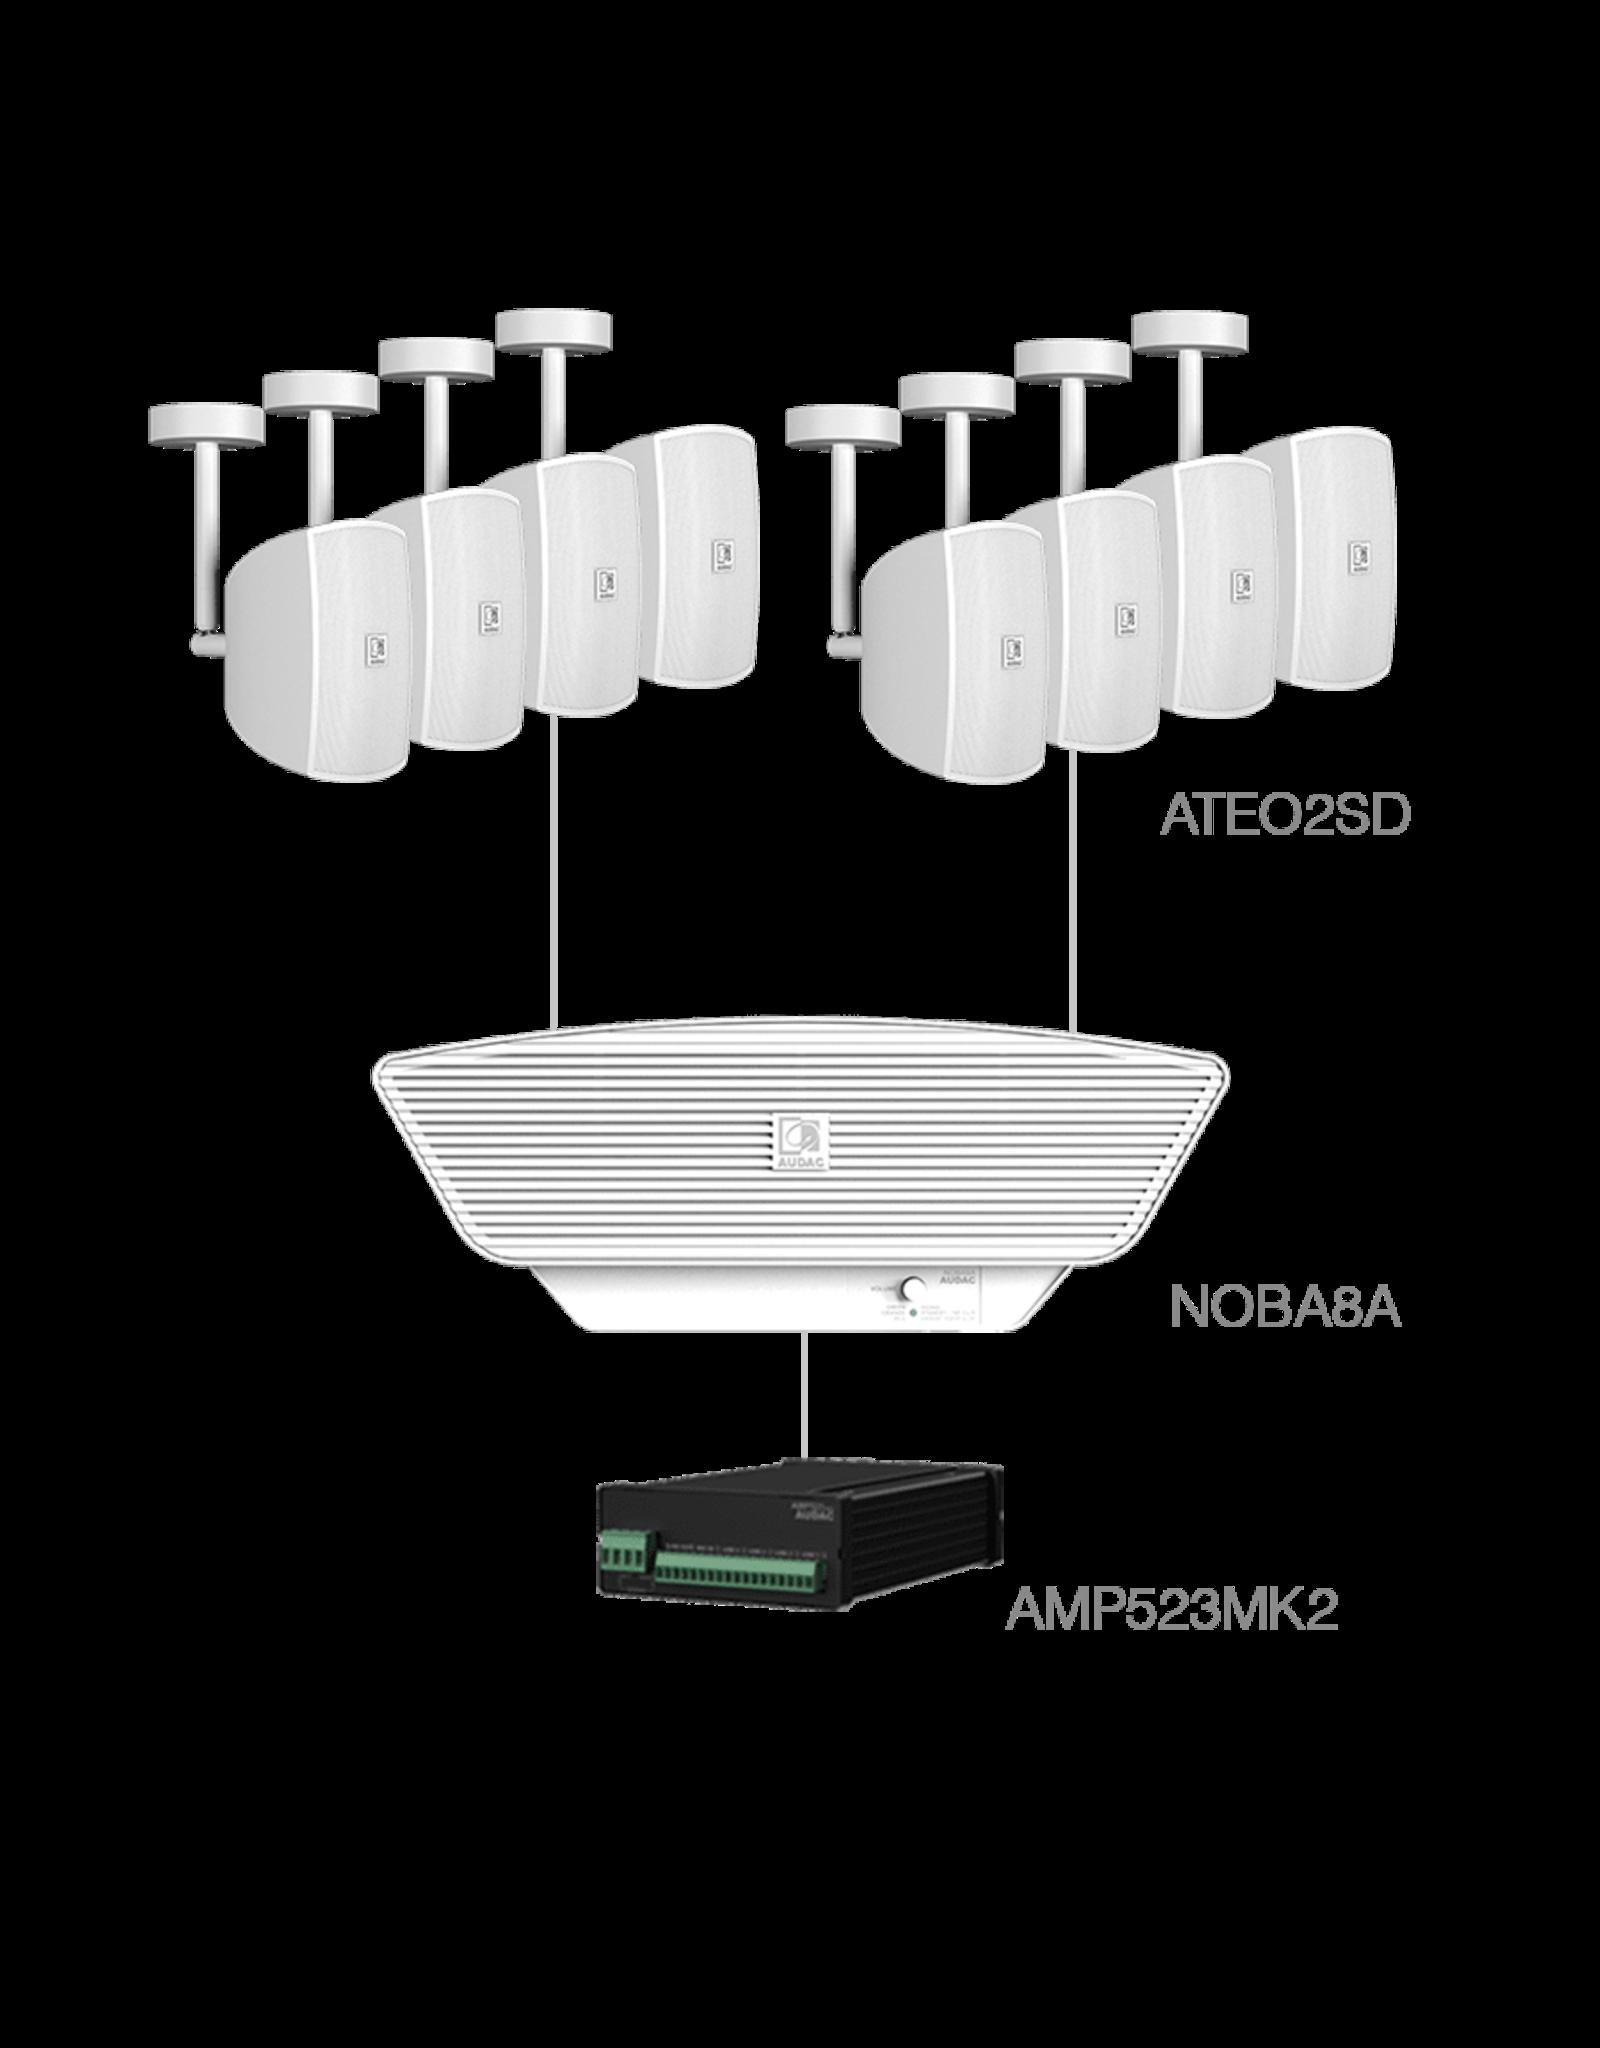 Audac 8x ATEO2SD + NOBA8A + AMP523MK2 White